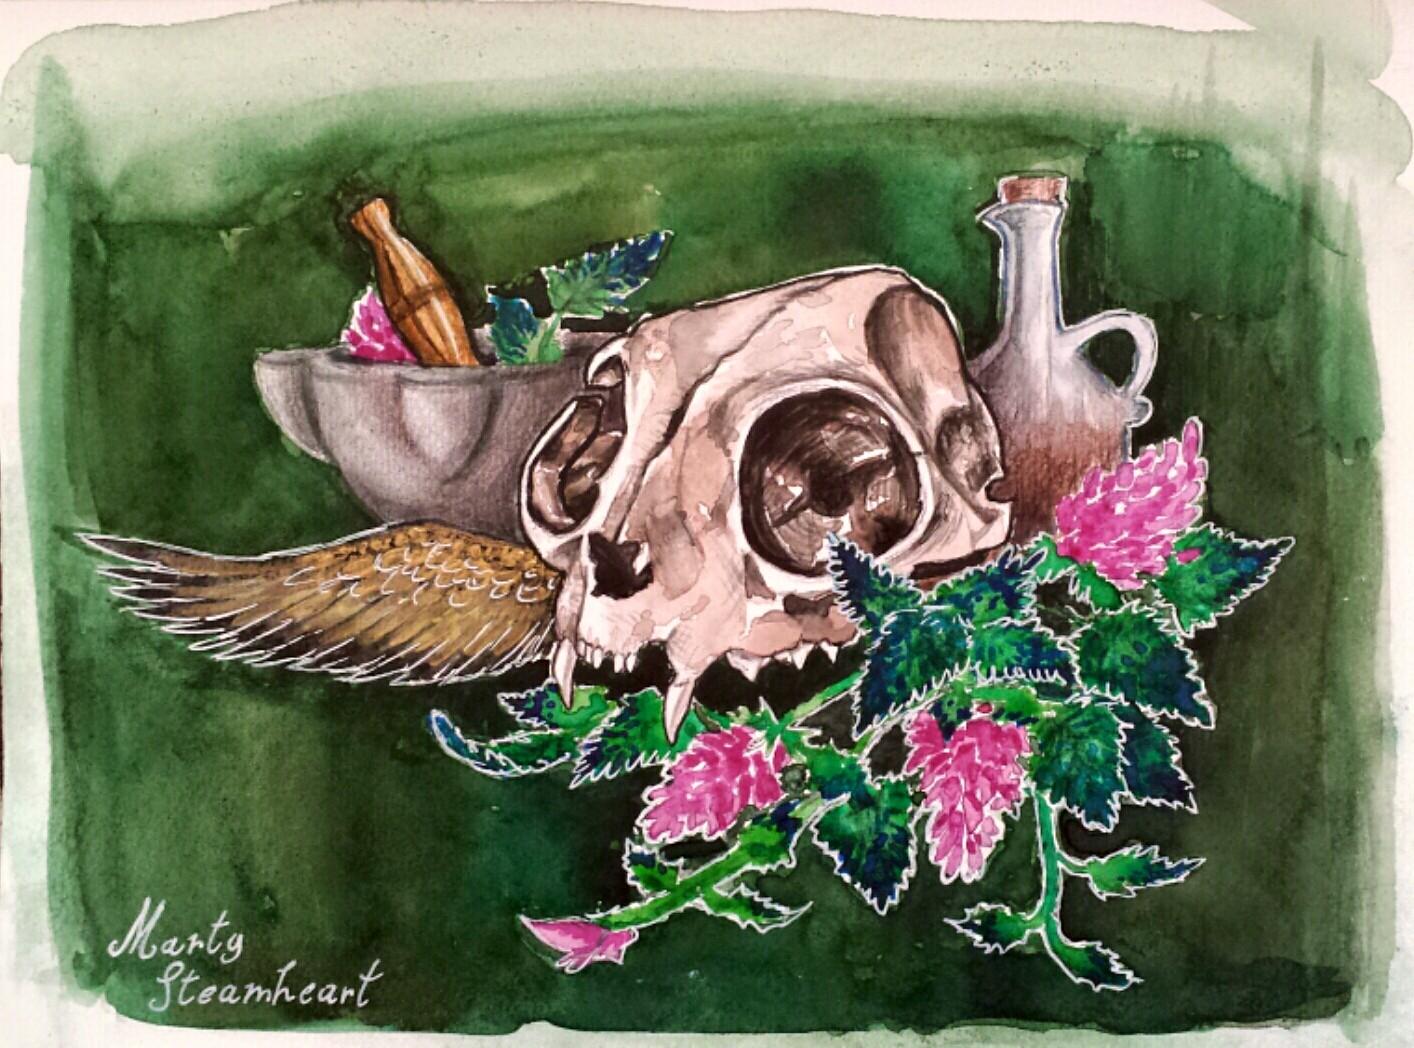 Natura moerta con teschio di gatto, dipinto di Martina Gargiulo / Steamheart Illustrations